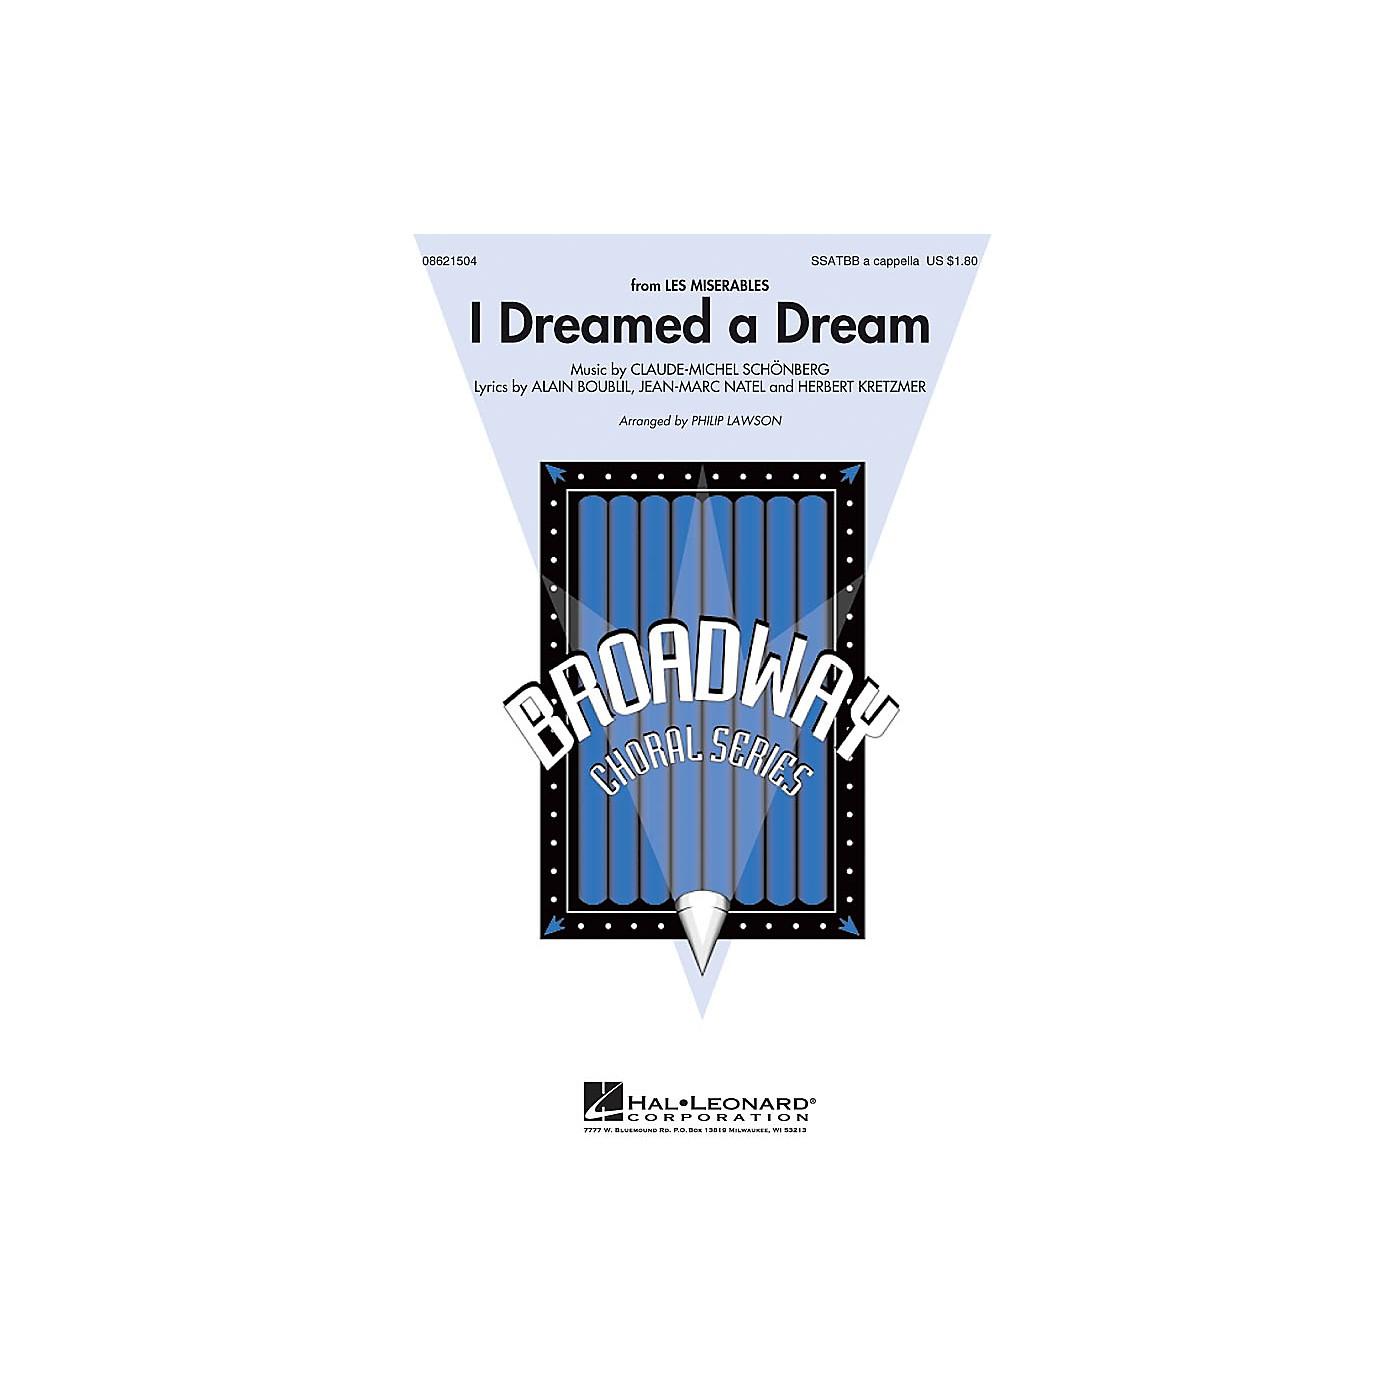 Hal Leonard I Dreamed a Dream (from Les Misérables) SATB DV A Cappella arranged by Philip Lawson thumbnail